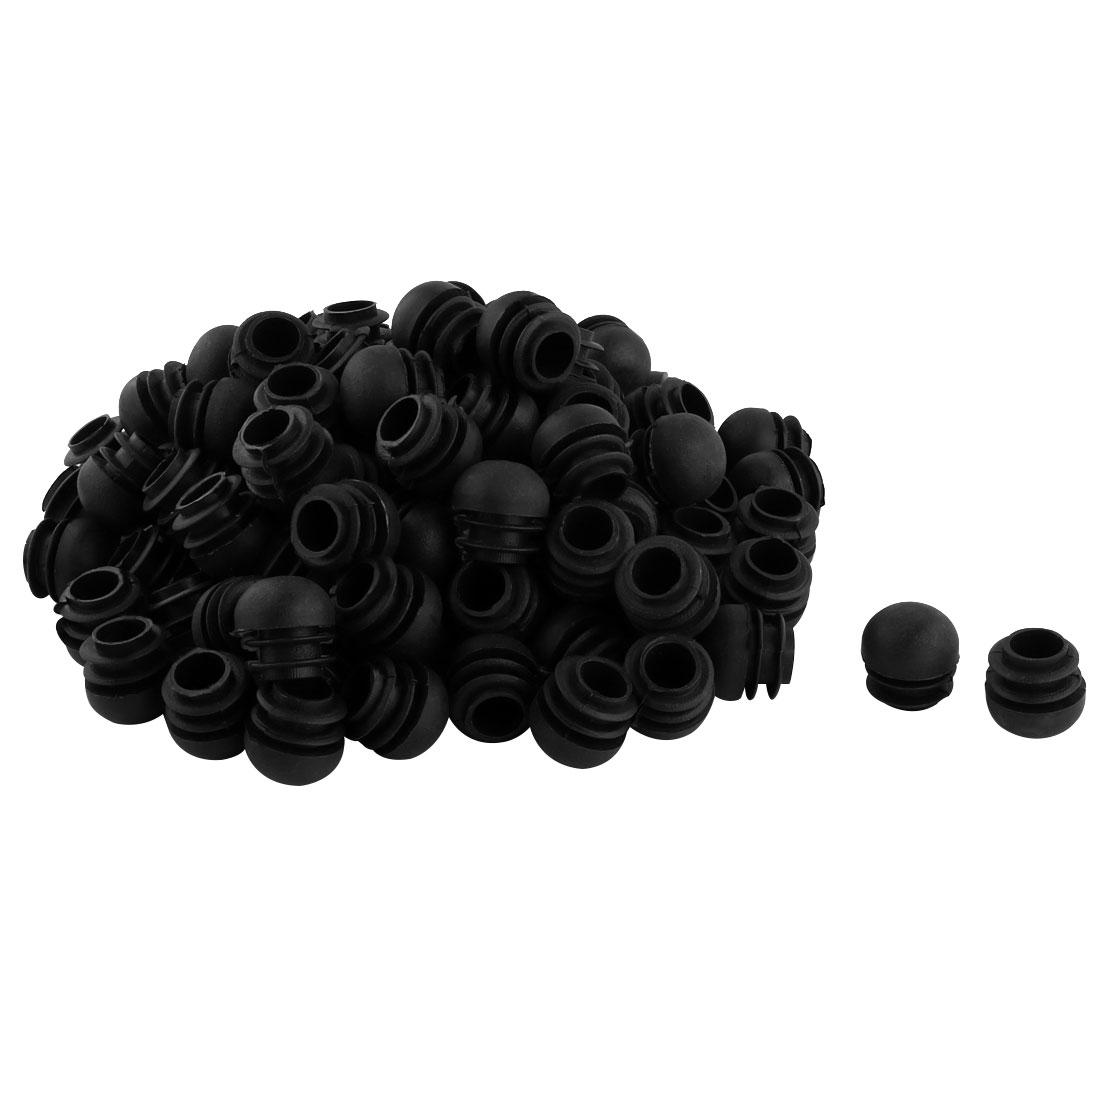 Plastic Round Ribbed Tube Inserts End Blanking Caps Black 22mm Diameter 100 Pcs